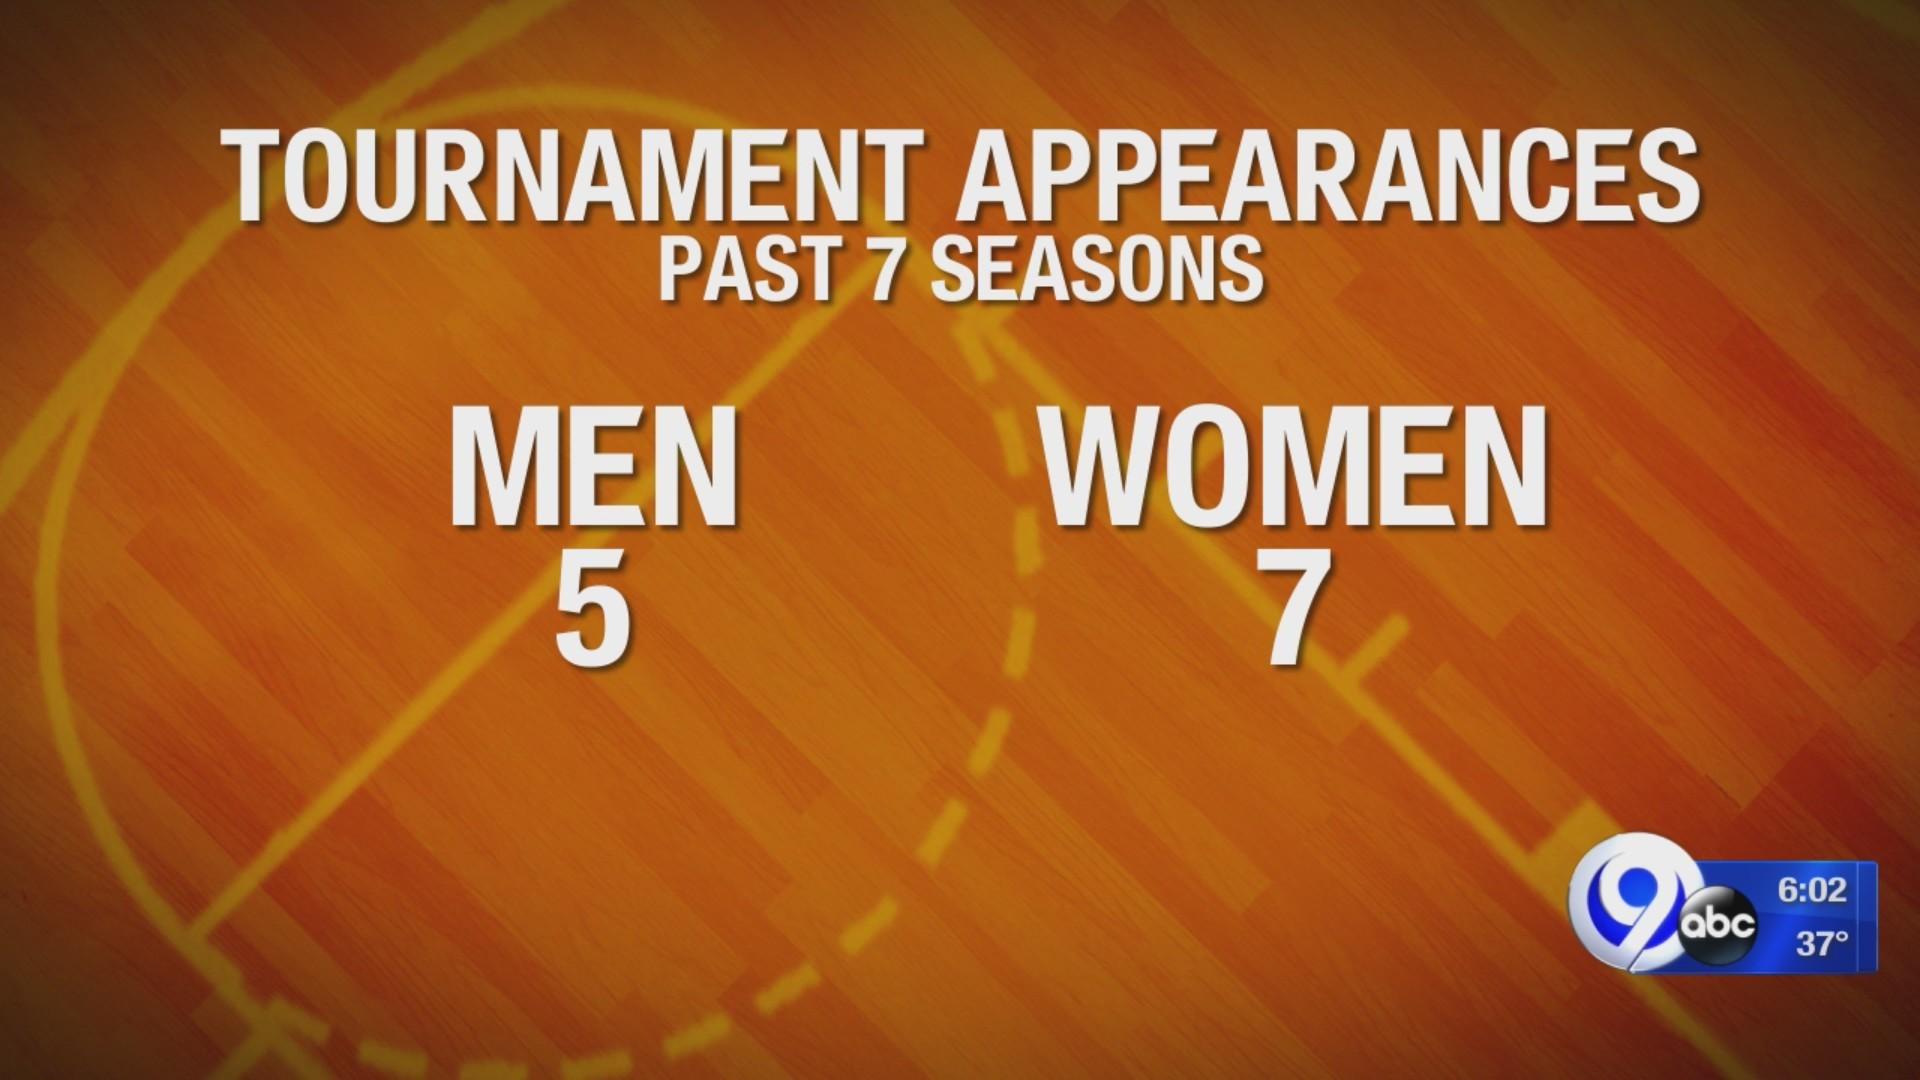 Despite_loss__Orange_women_s_team_on_bet_0_20190326024200